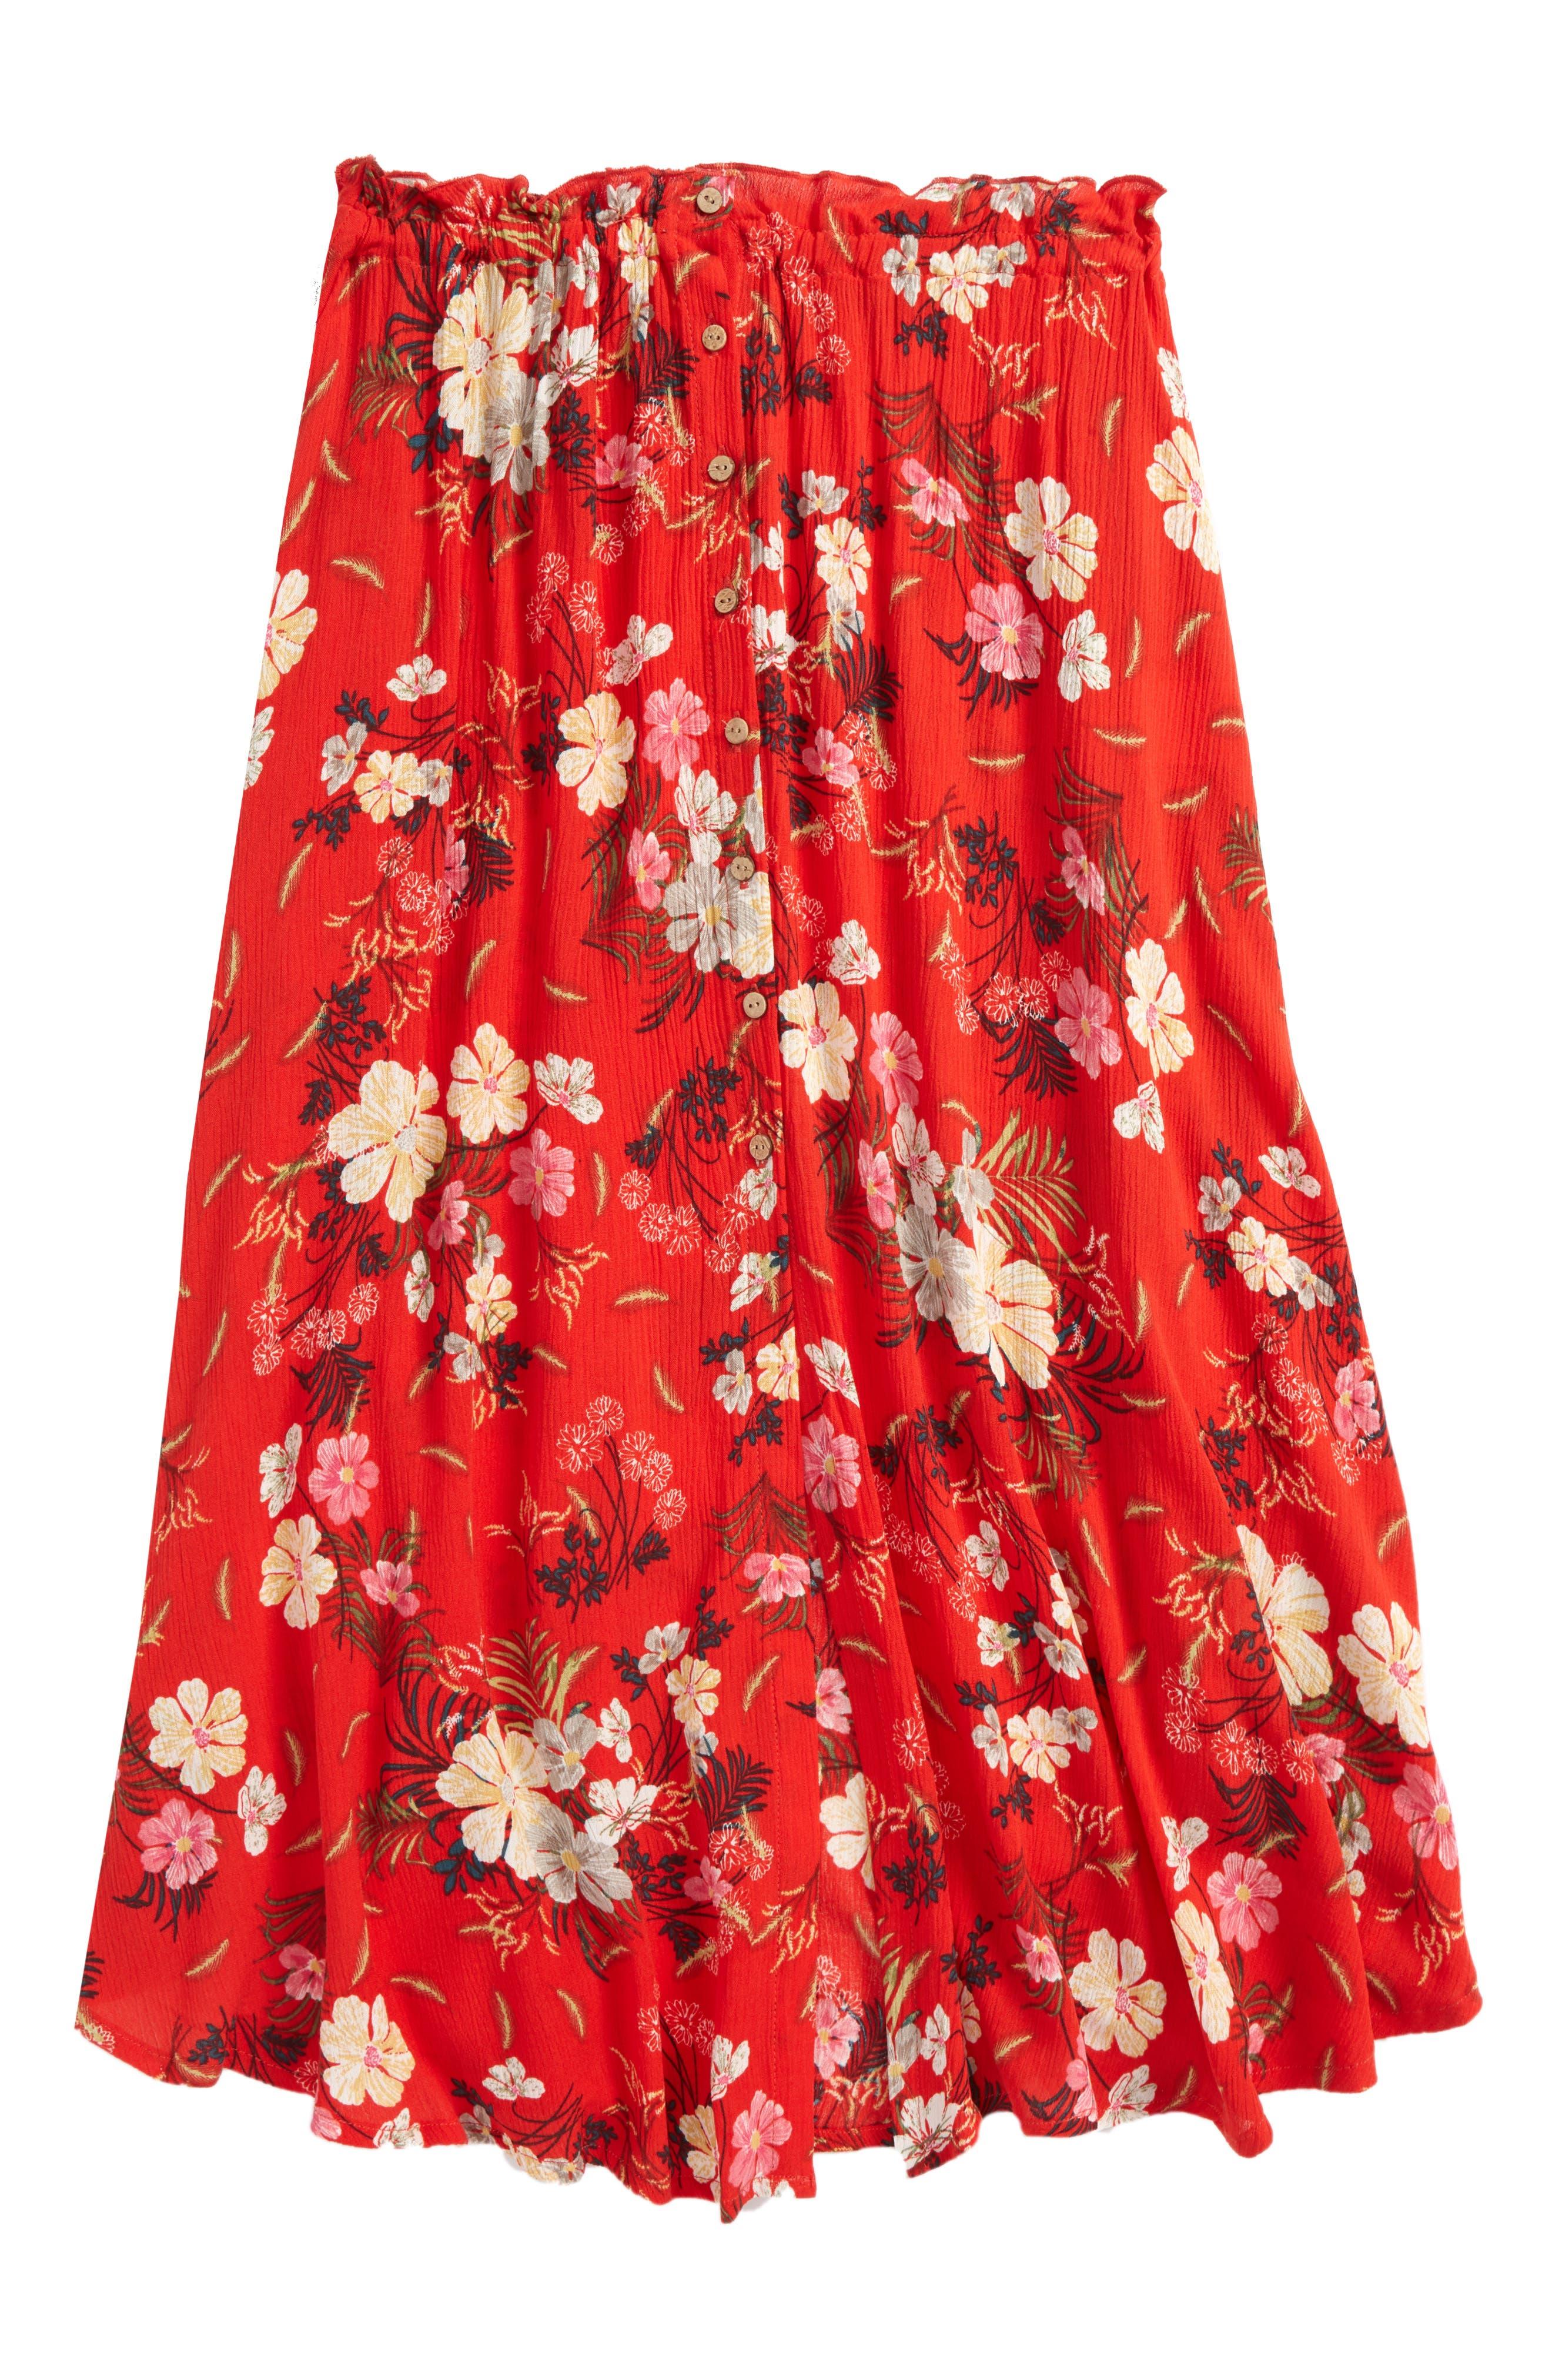 Caroline Floral Skirt,                             Main thumbnail 1, color,                             Poppy Red